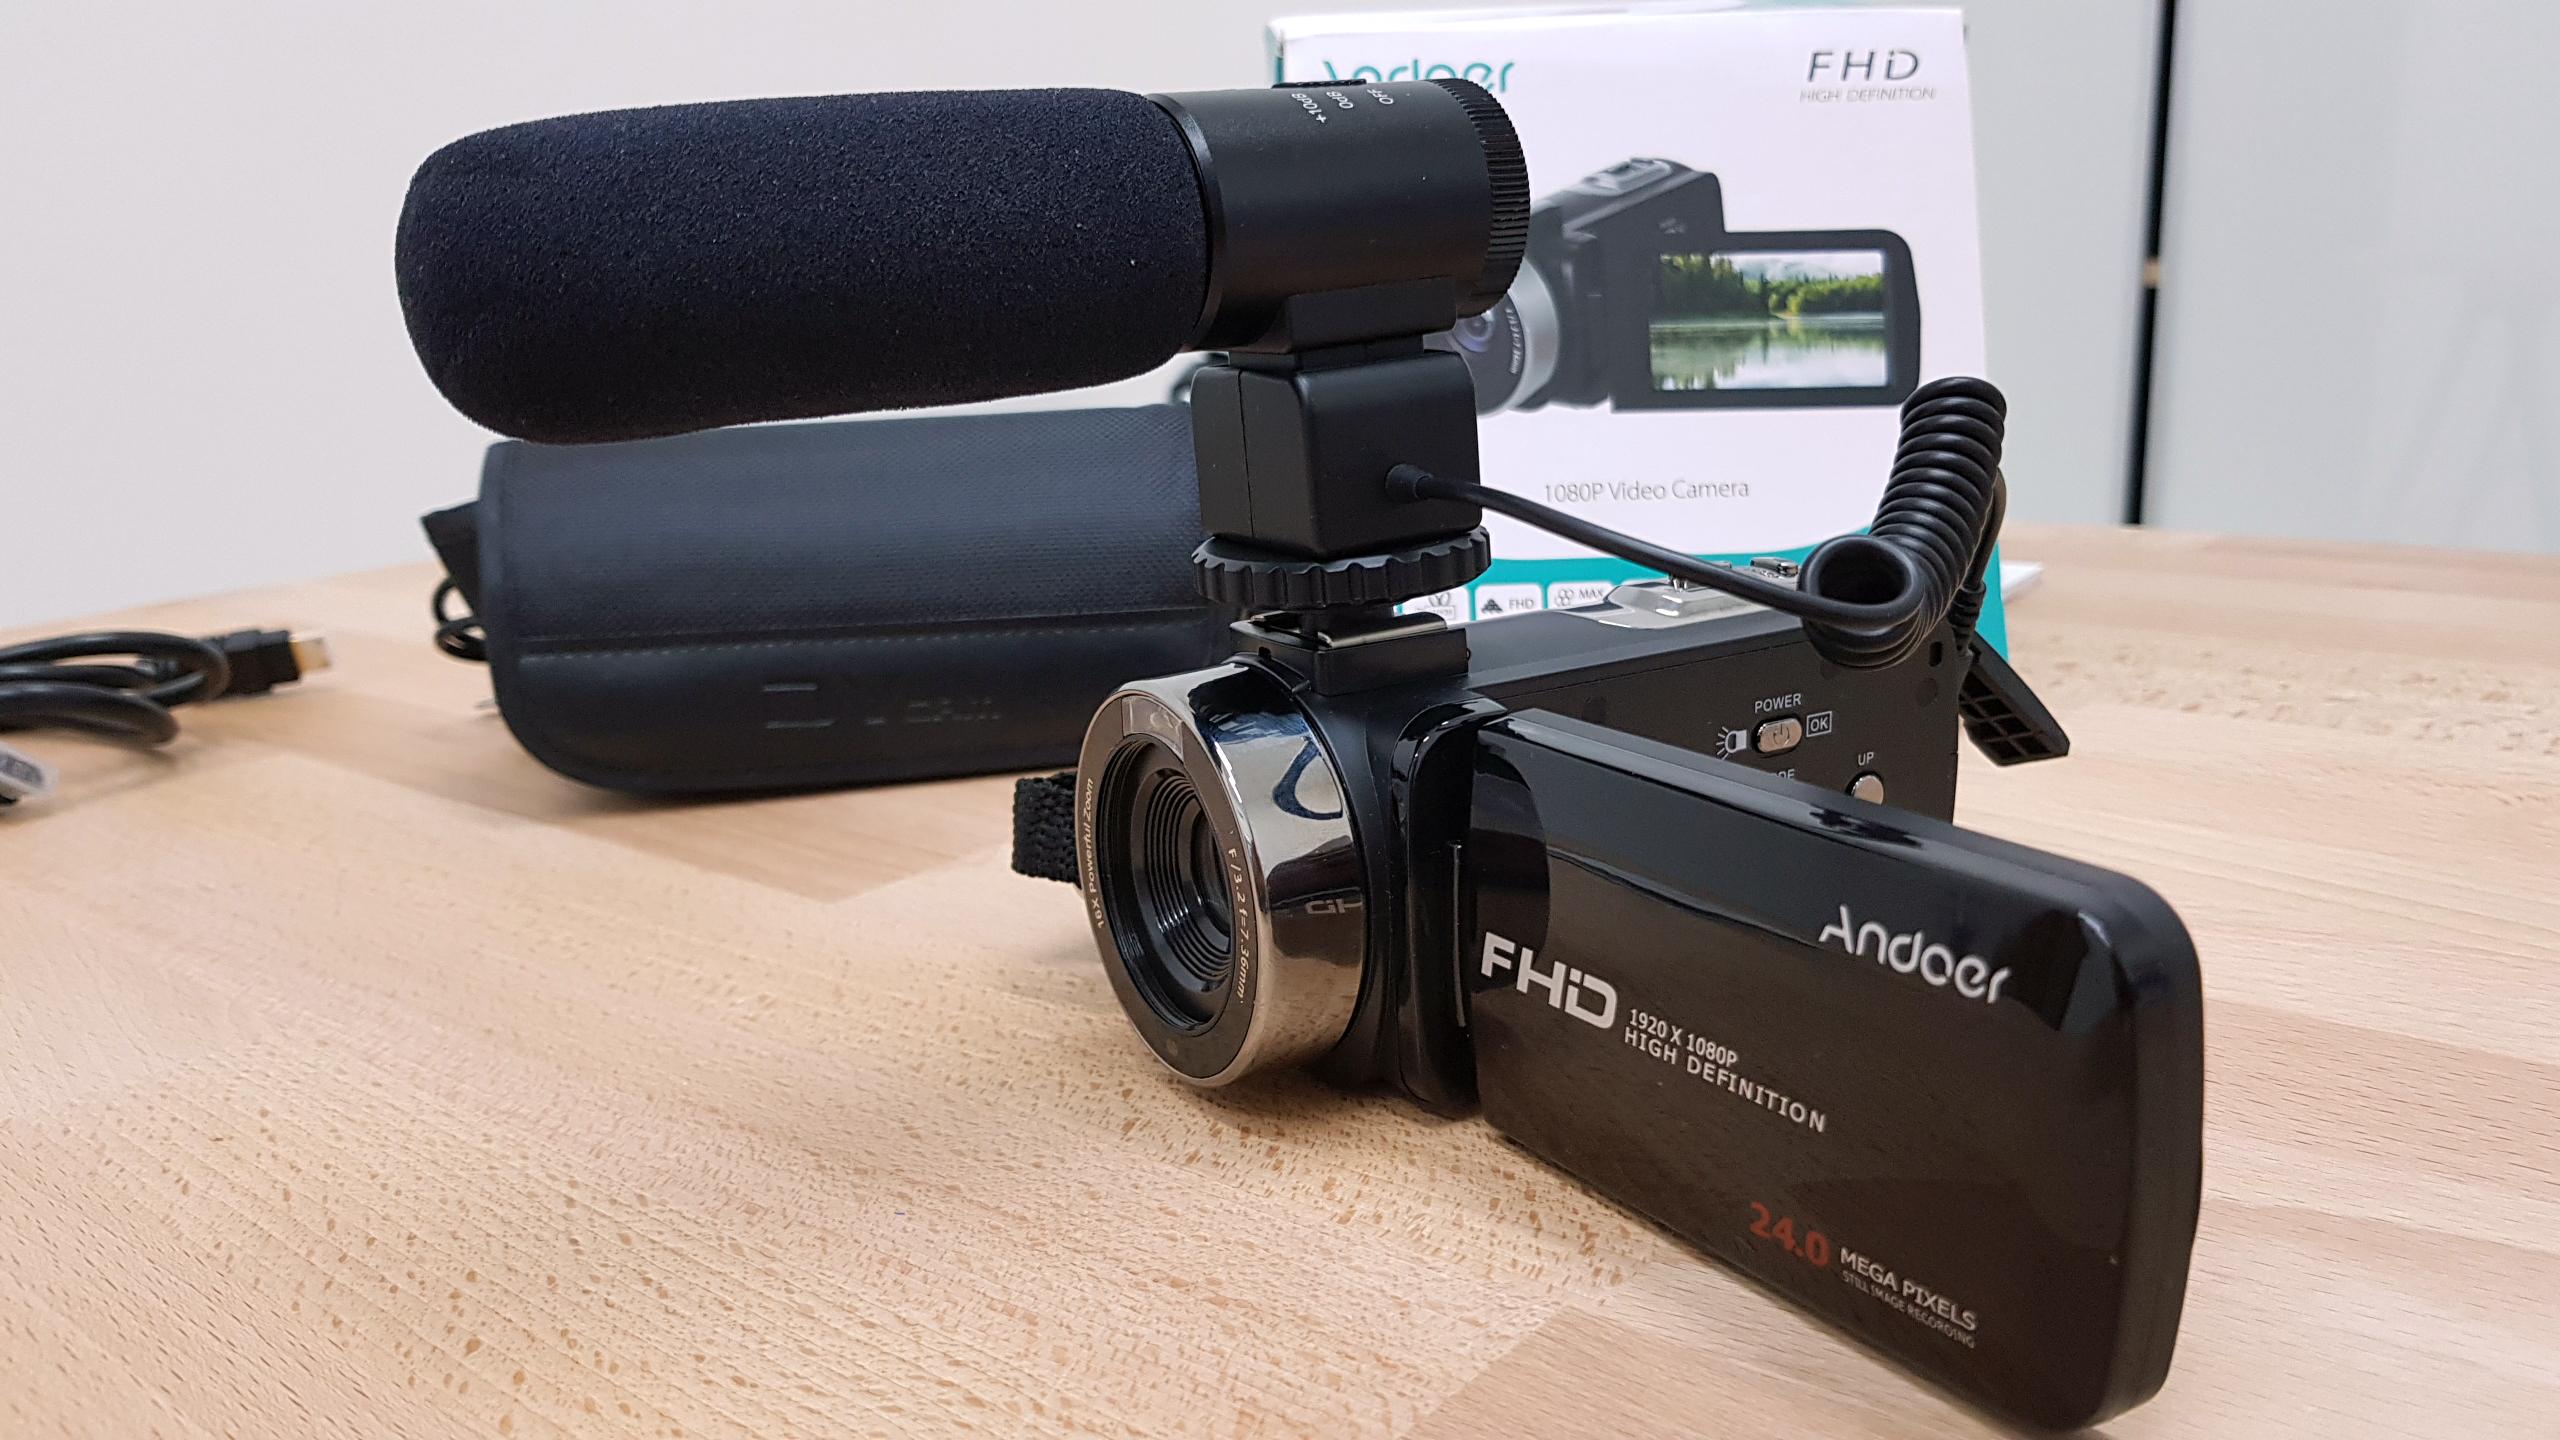 videocamera andoer